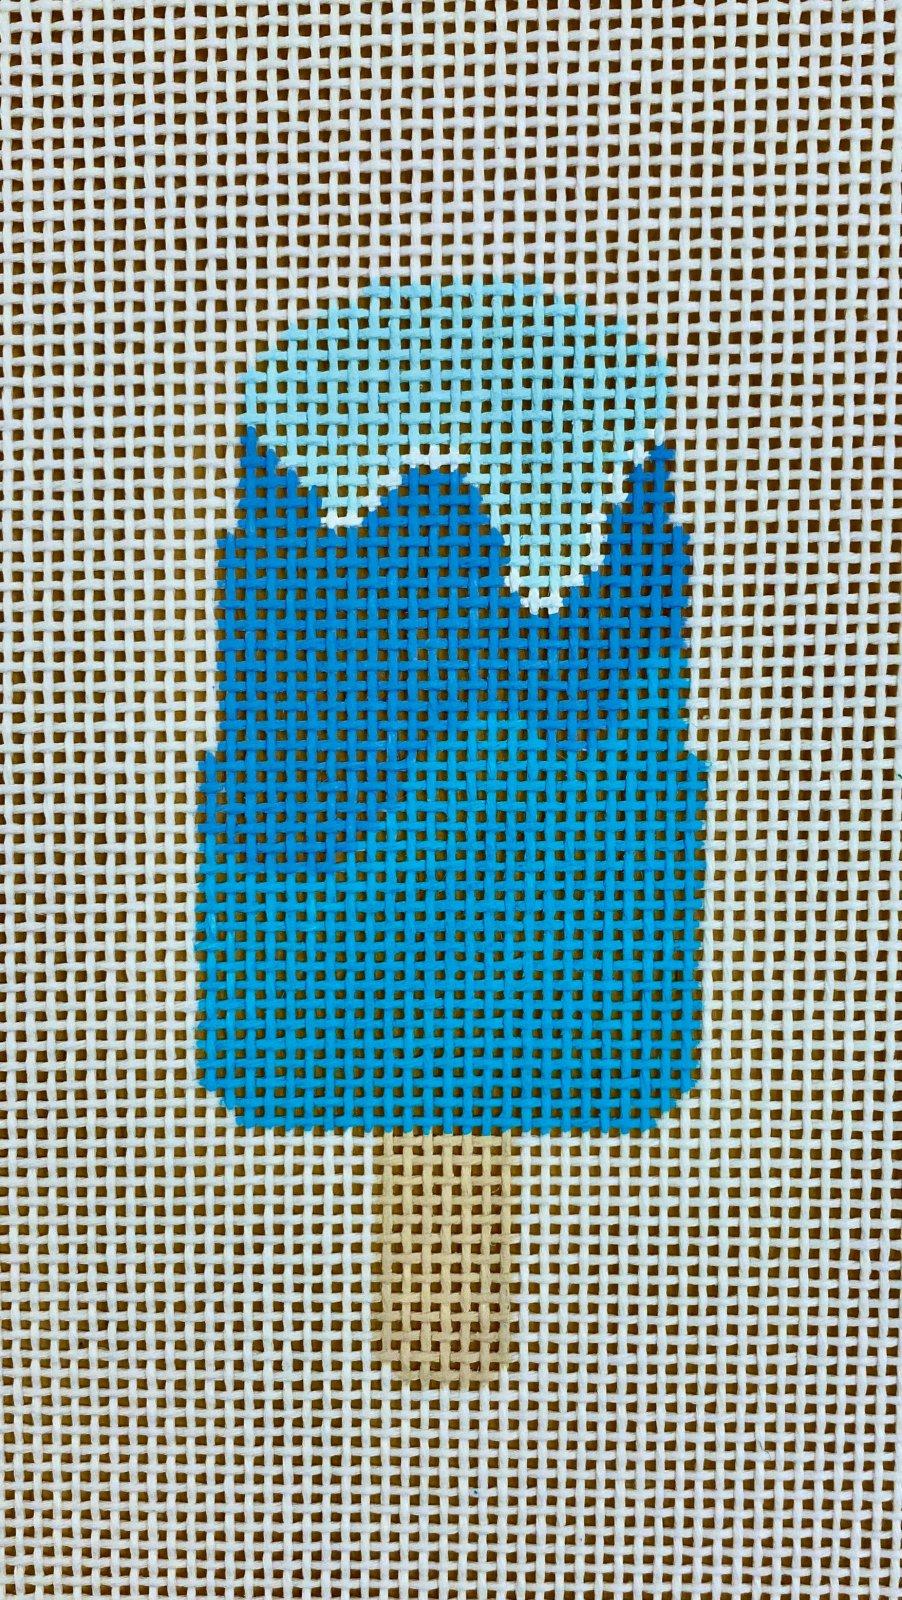 popsicle, blue